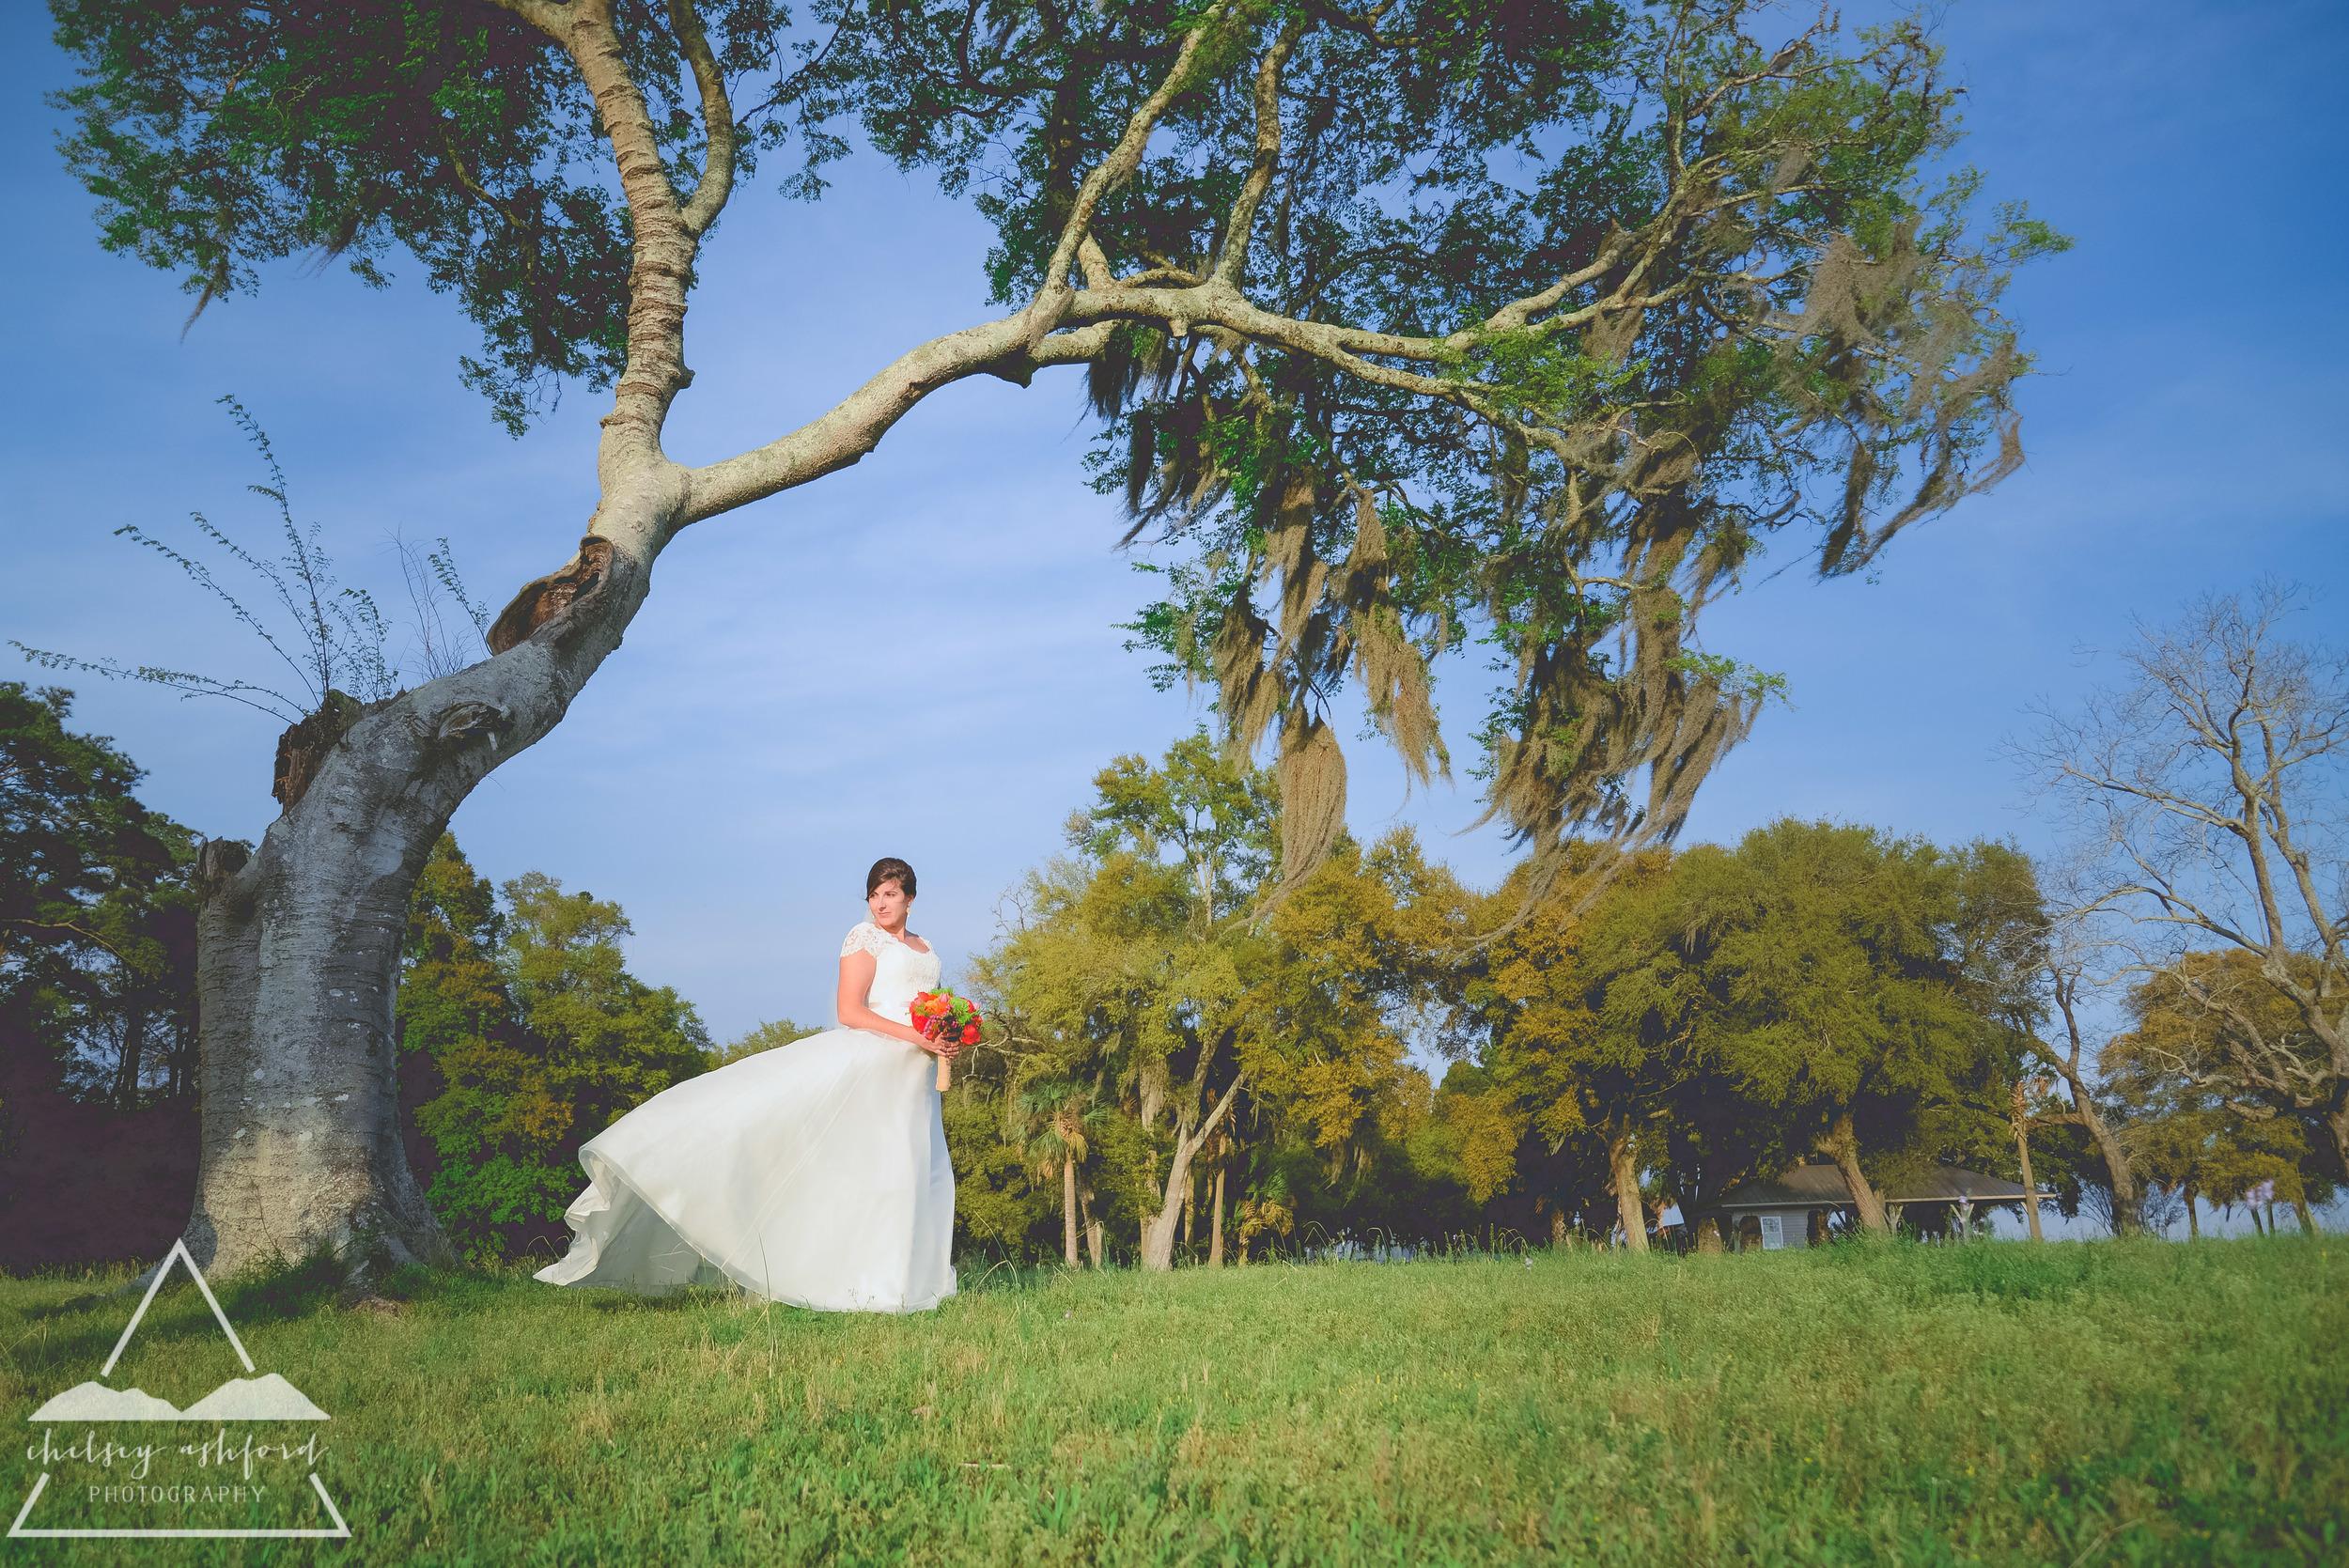 Sylvia_bridals_web-35.jpg